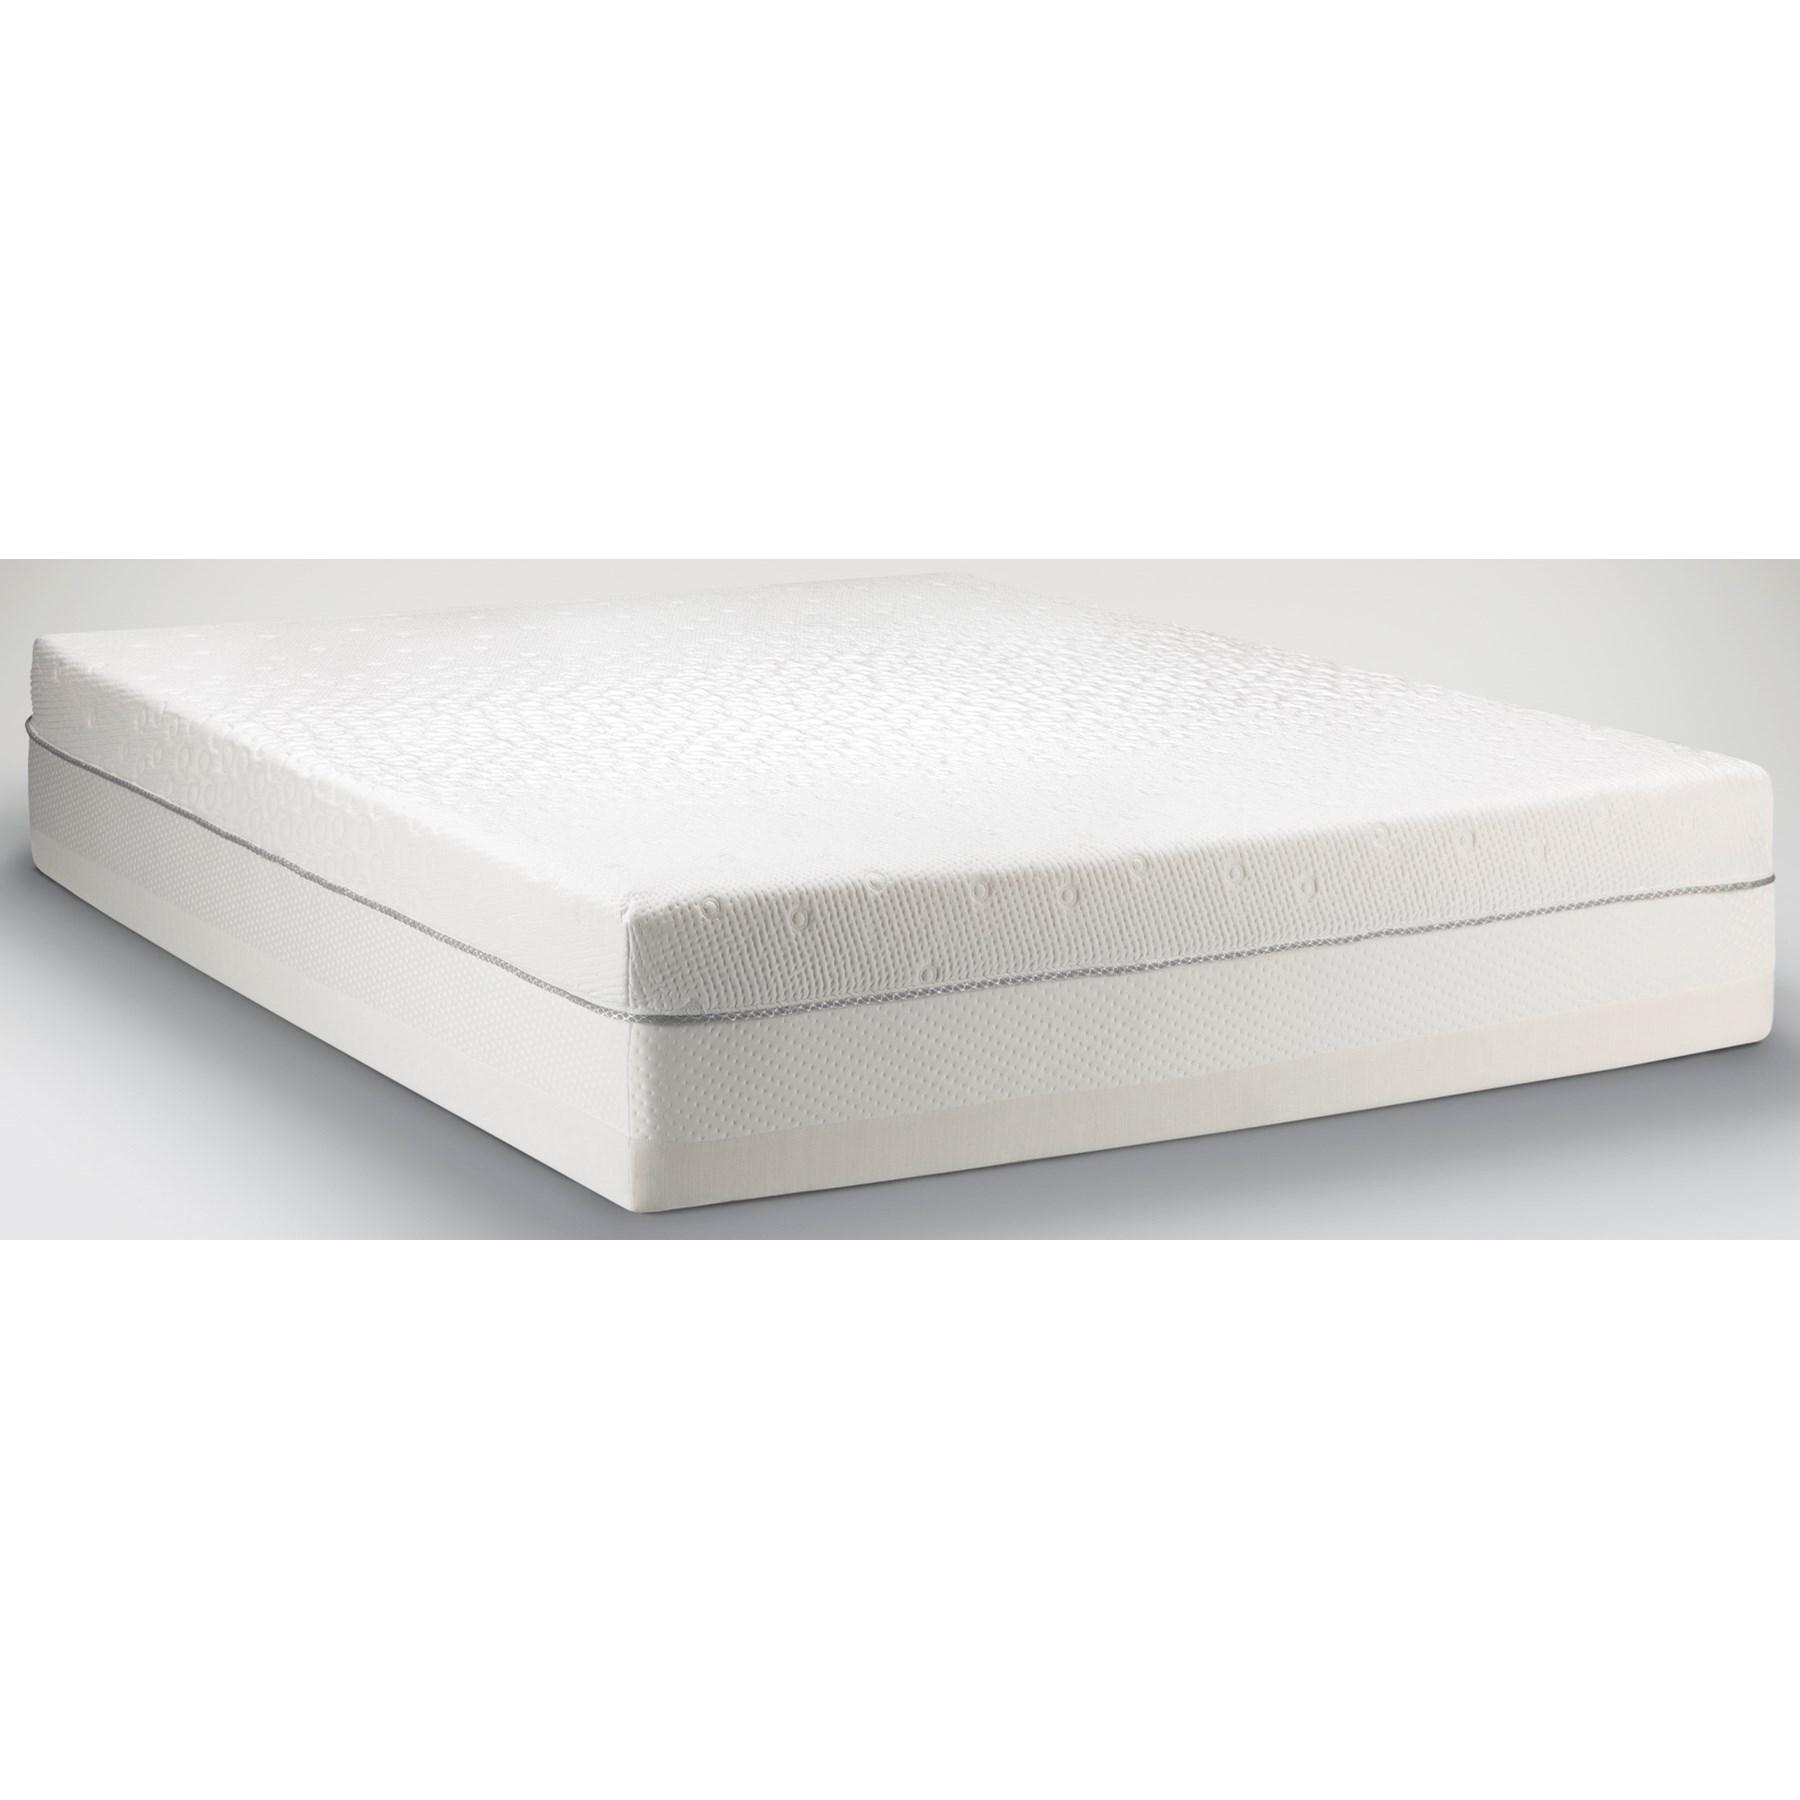 Tempur-Pedic®  TEMPUR-Choice™  Supreme Cal King Firm to Medium Soft Mattress  - Item Number: 10111180